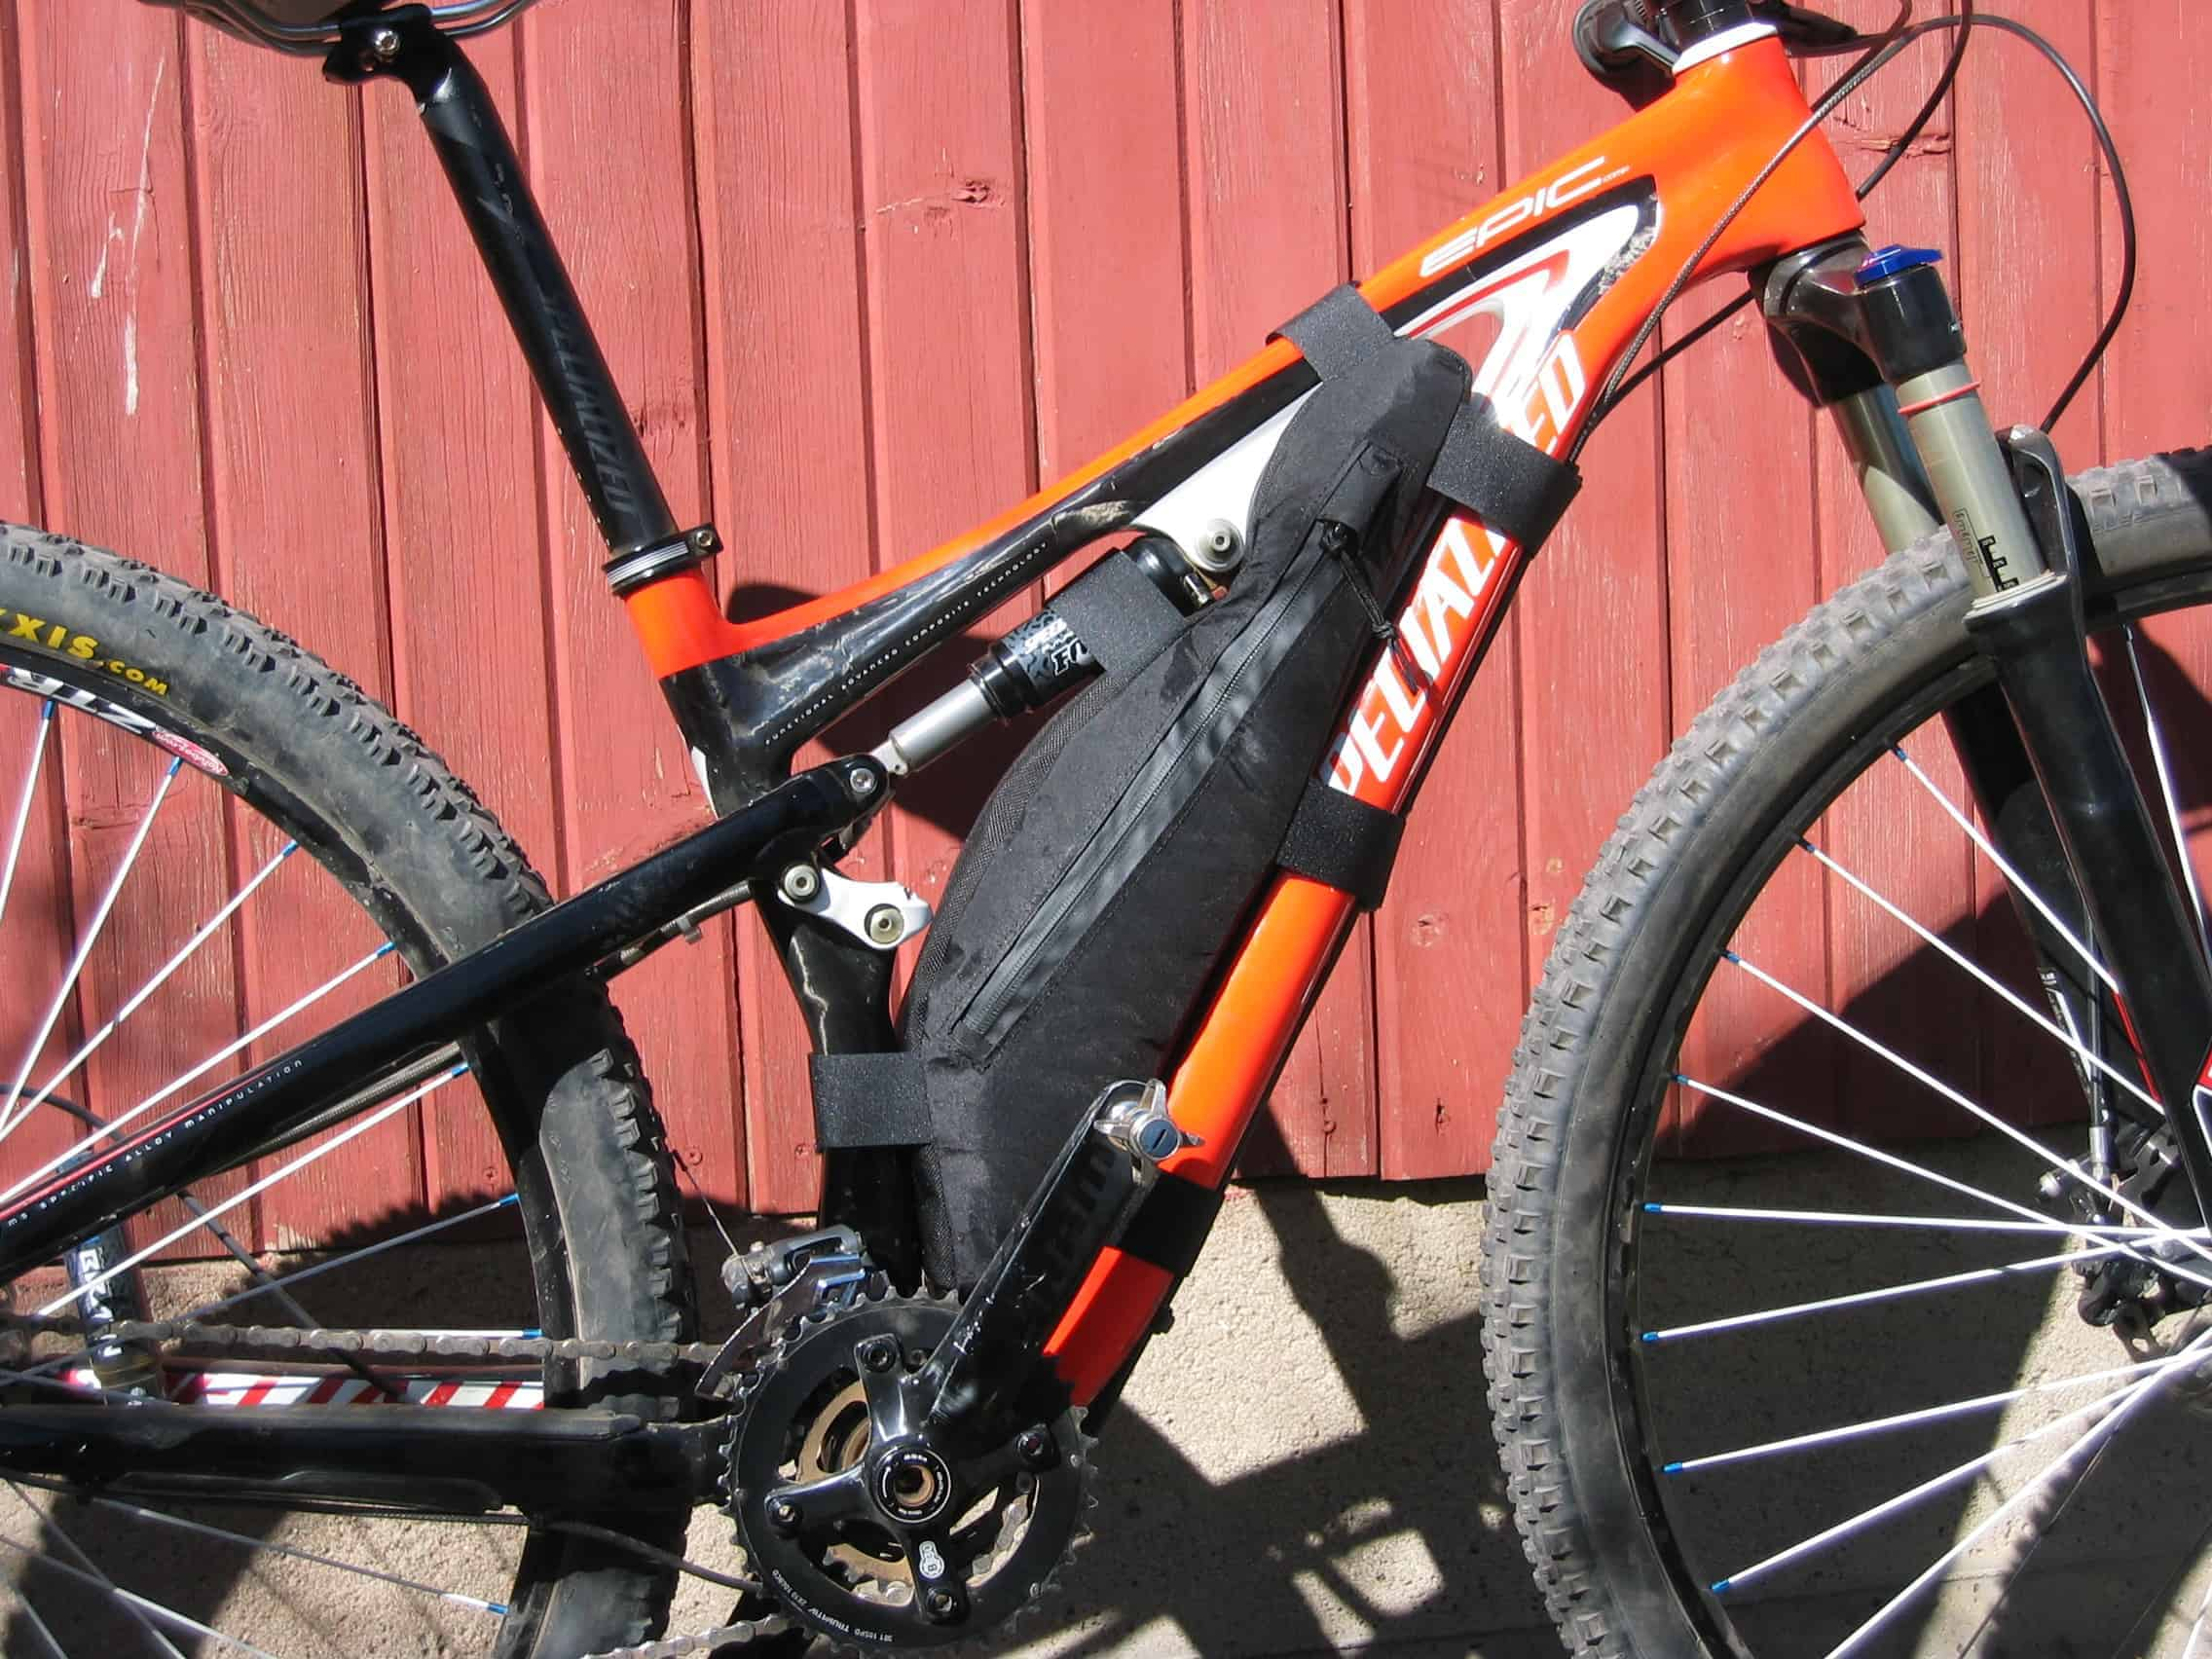 Mountain Bike Camping And Bikepacking Guide